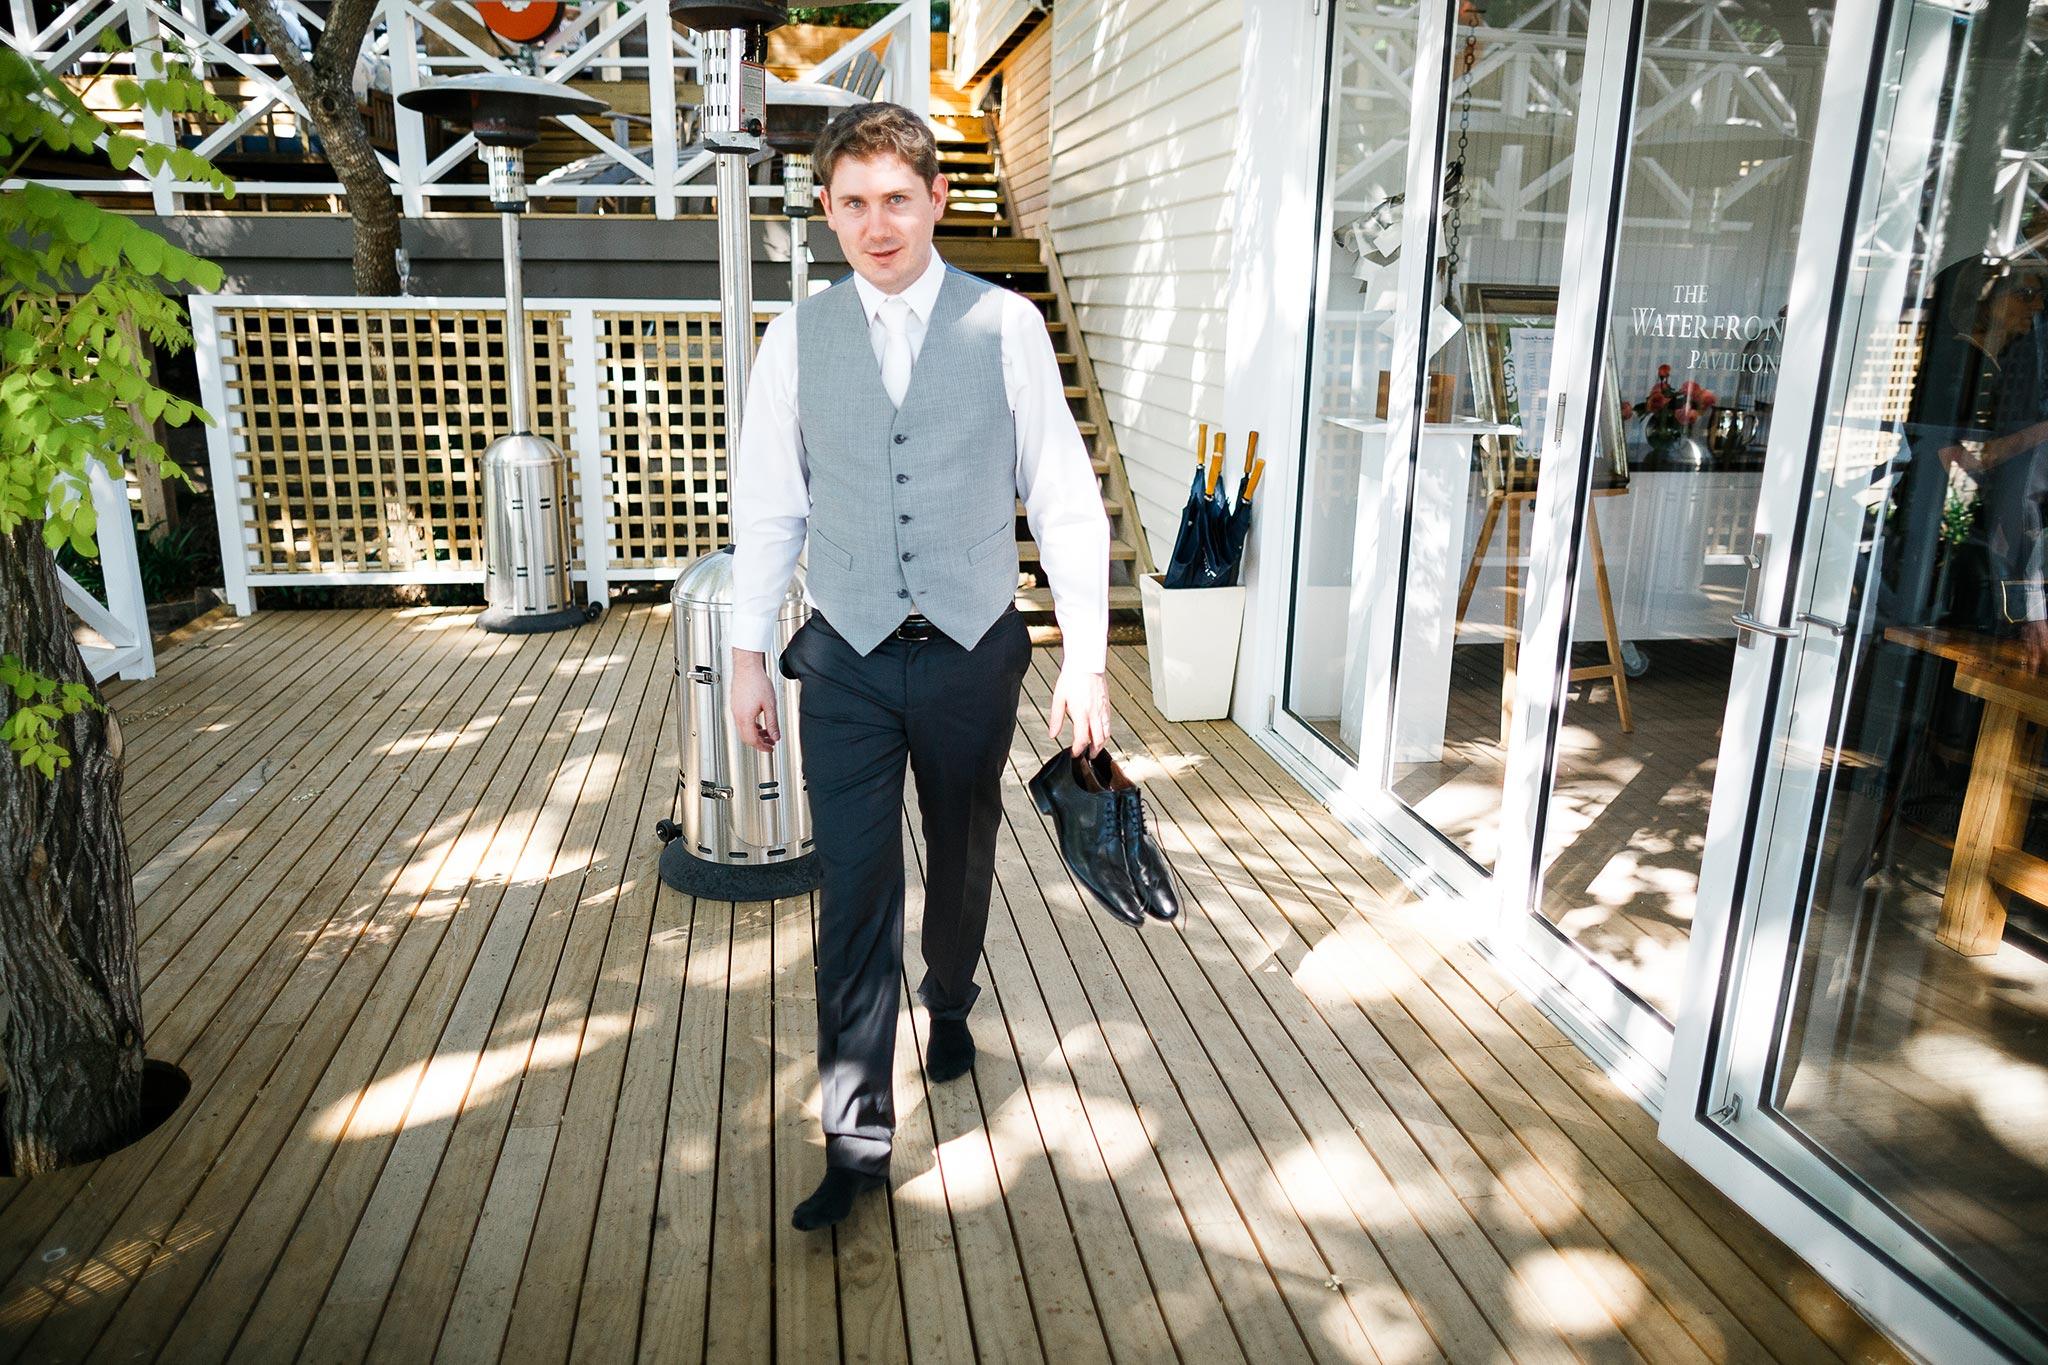 Daylesford-Lake-House-Wedding-Photographer-lunch-reception-groom-leaving